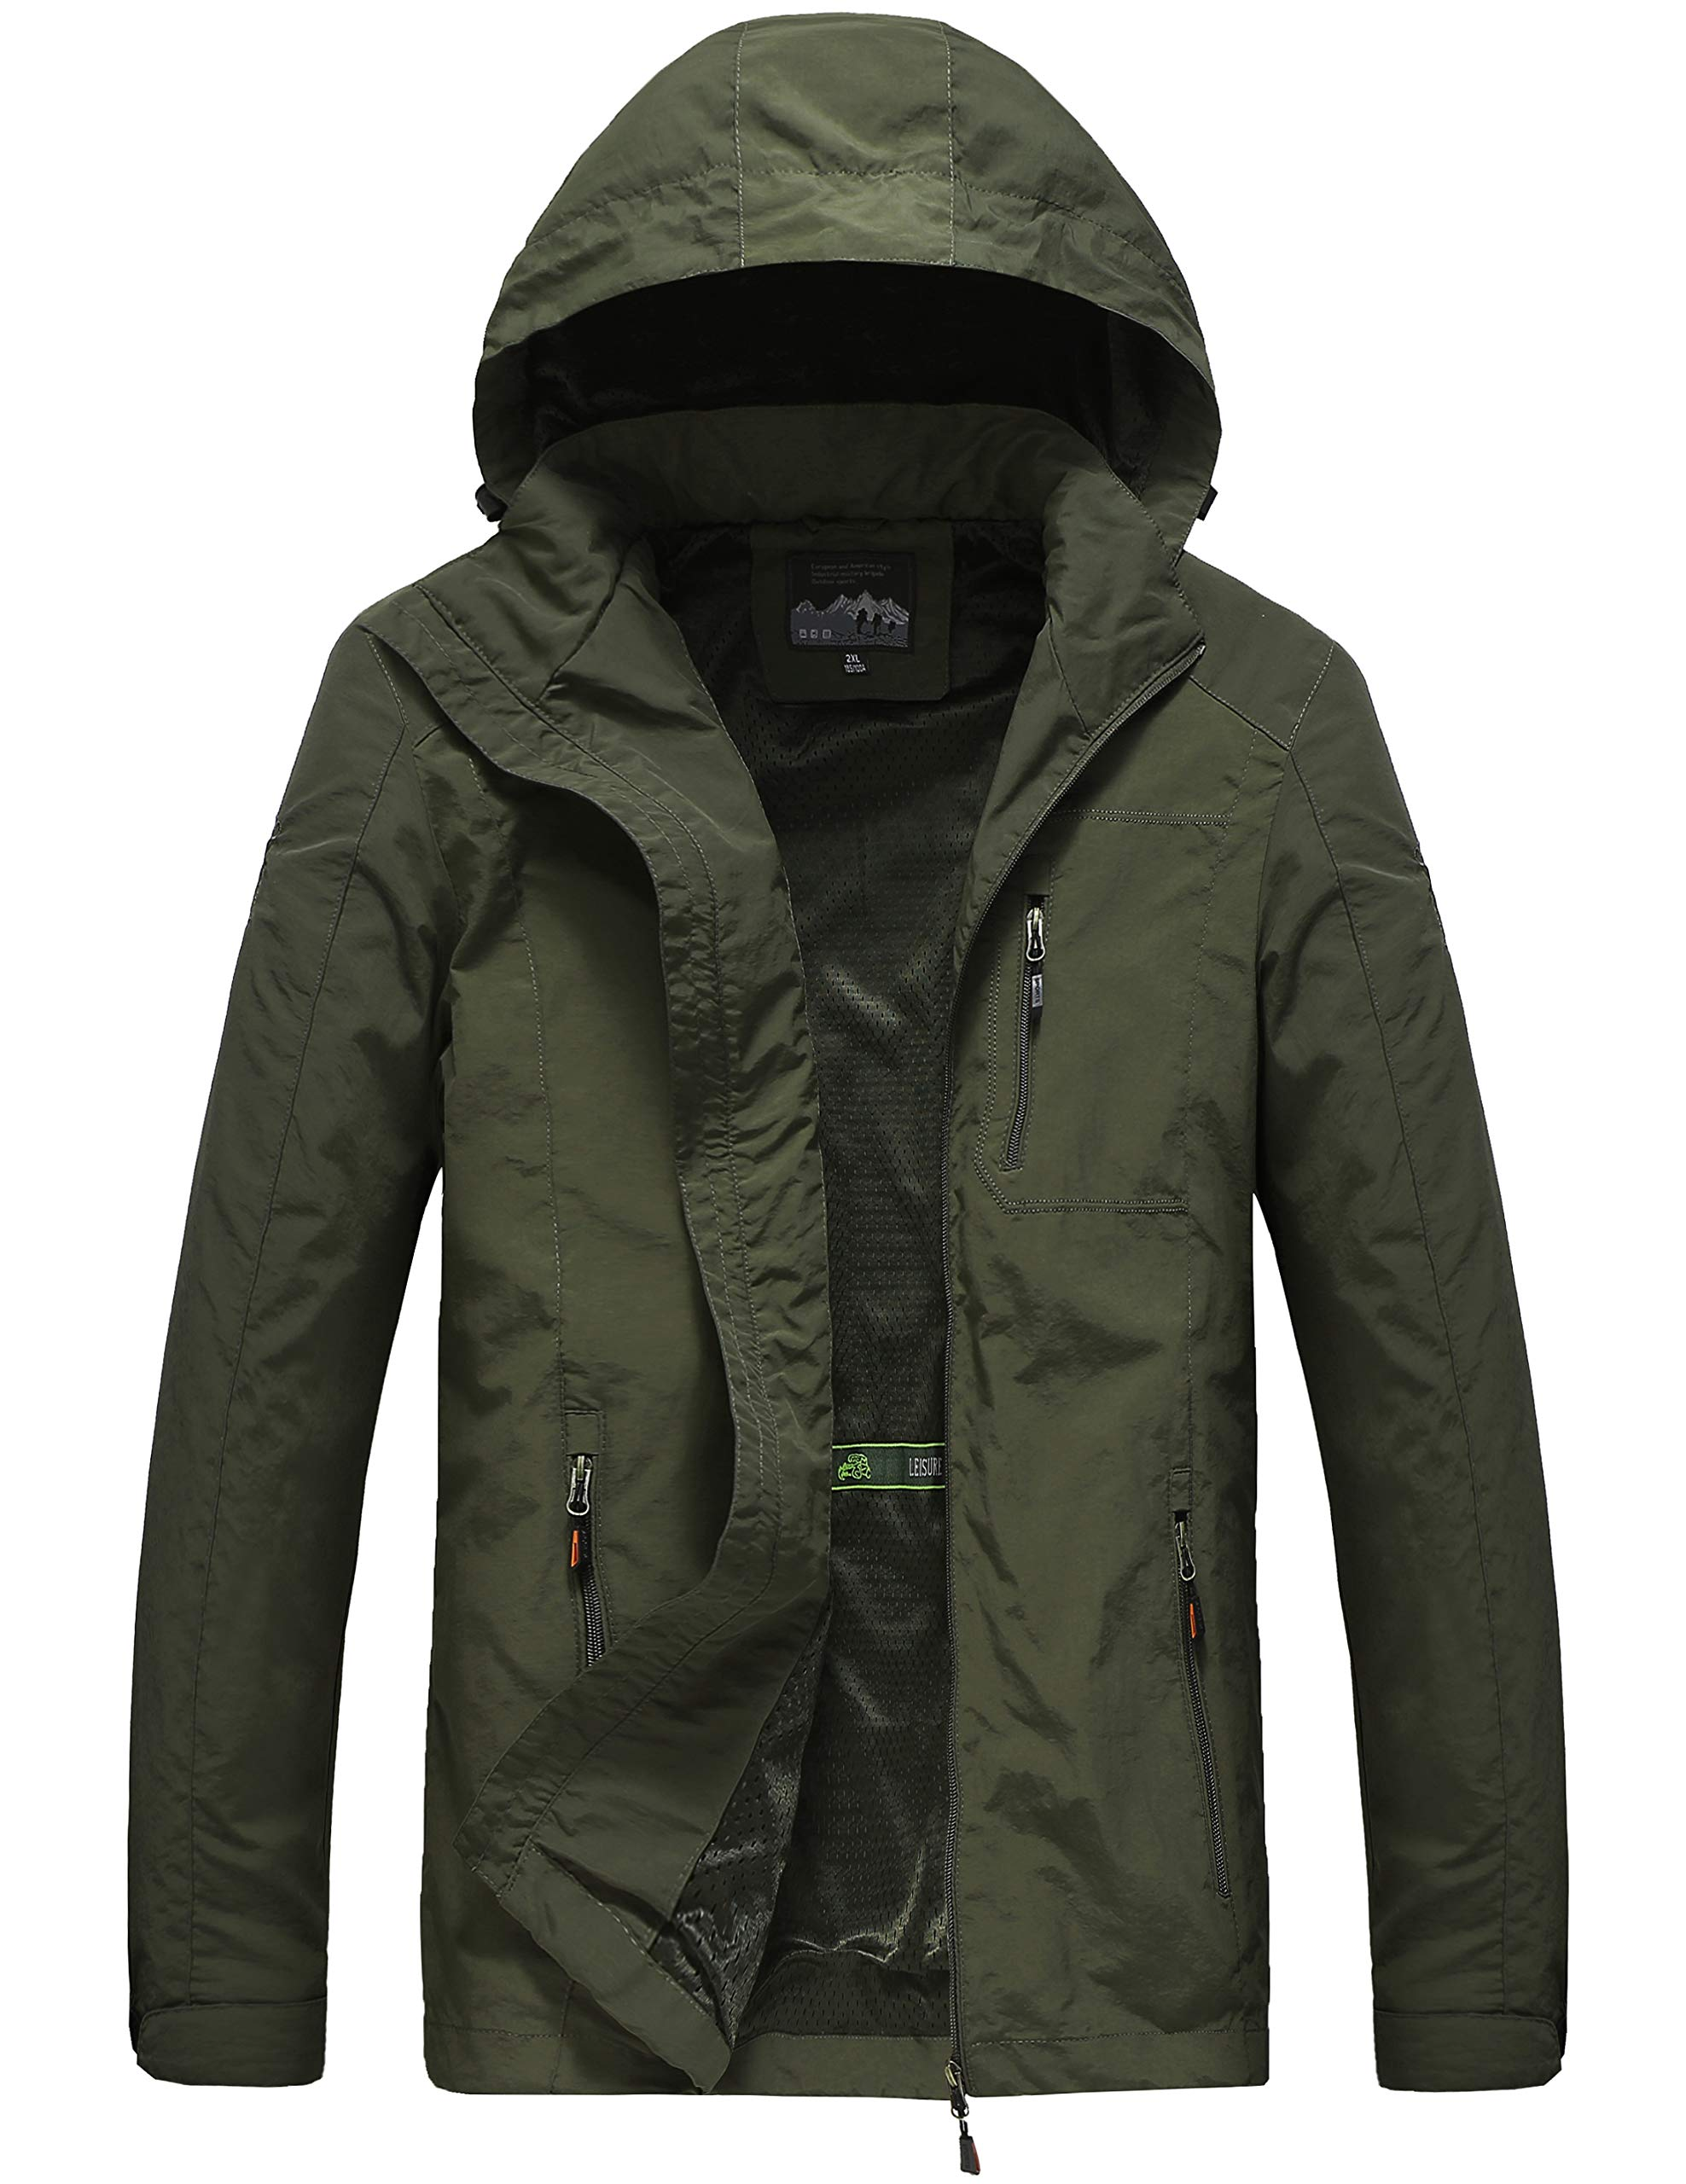 Pinkpum Army Green Lightweight Jacket for Men L by Pinkpum